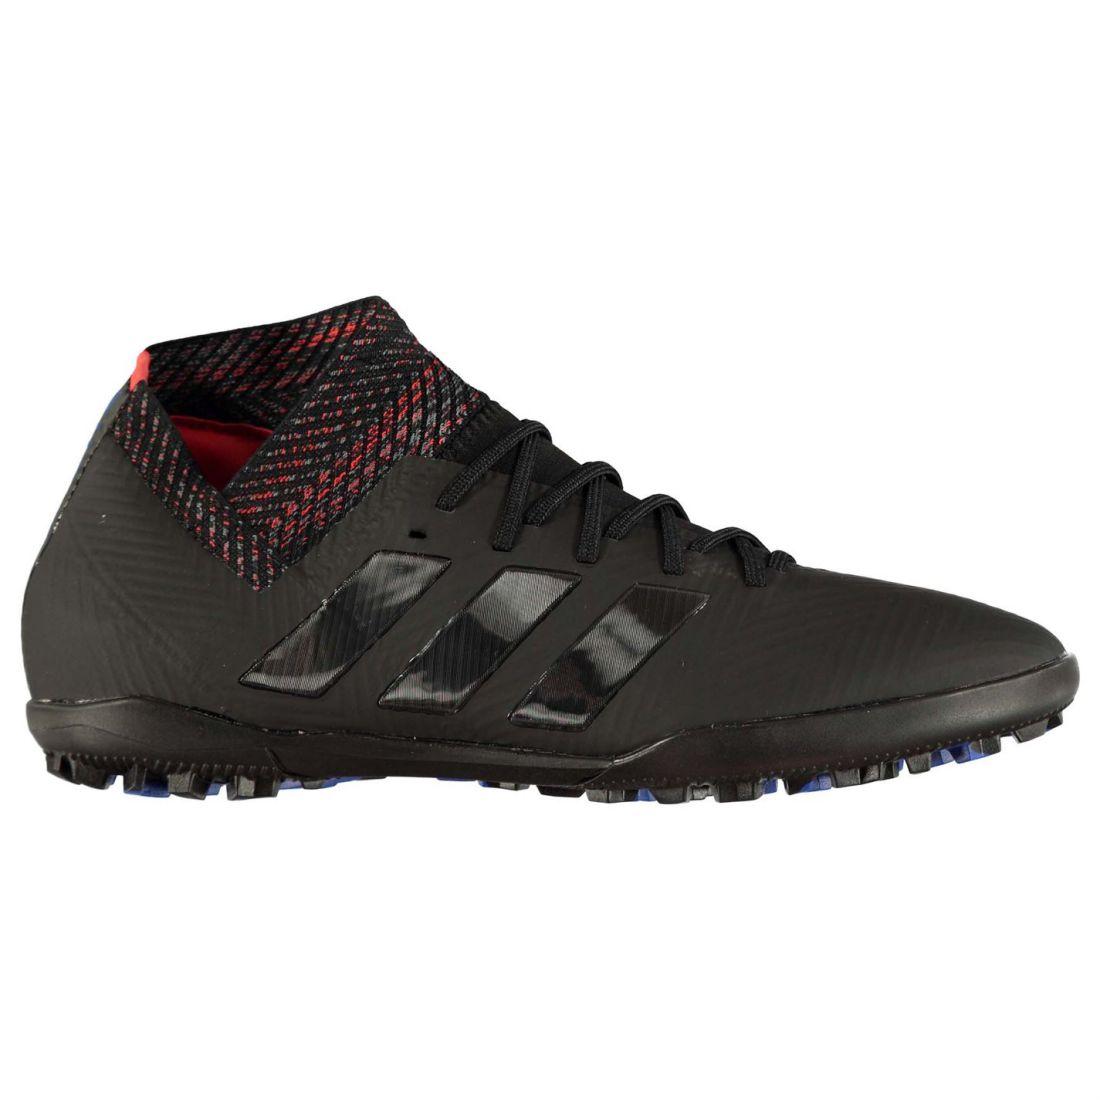 adidas Mens Nemeziz Tango 18.3 Astro Turf Trainers Football Boots Lace Up Mesh